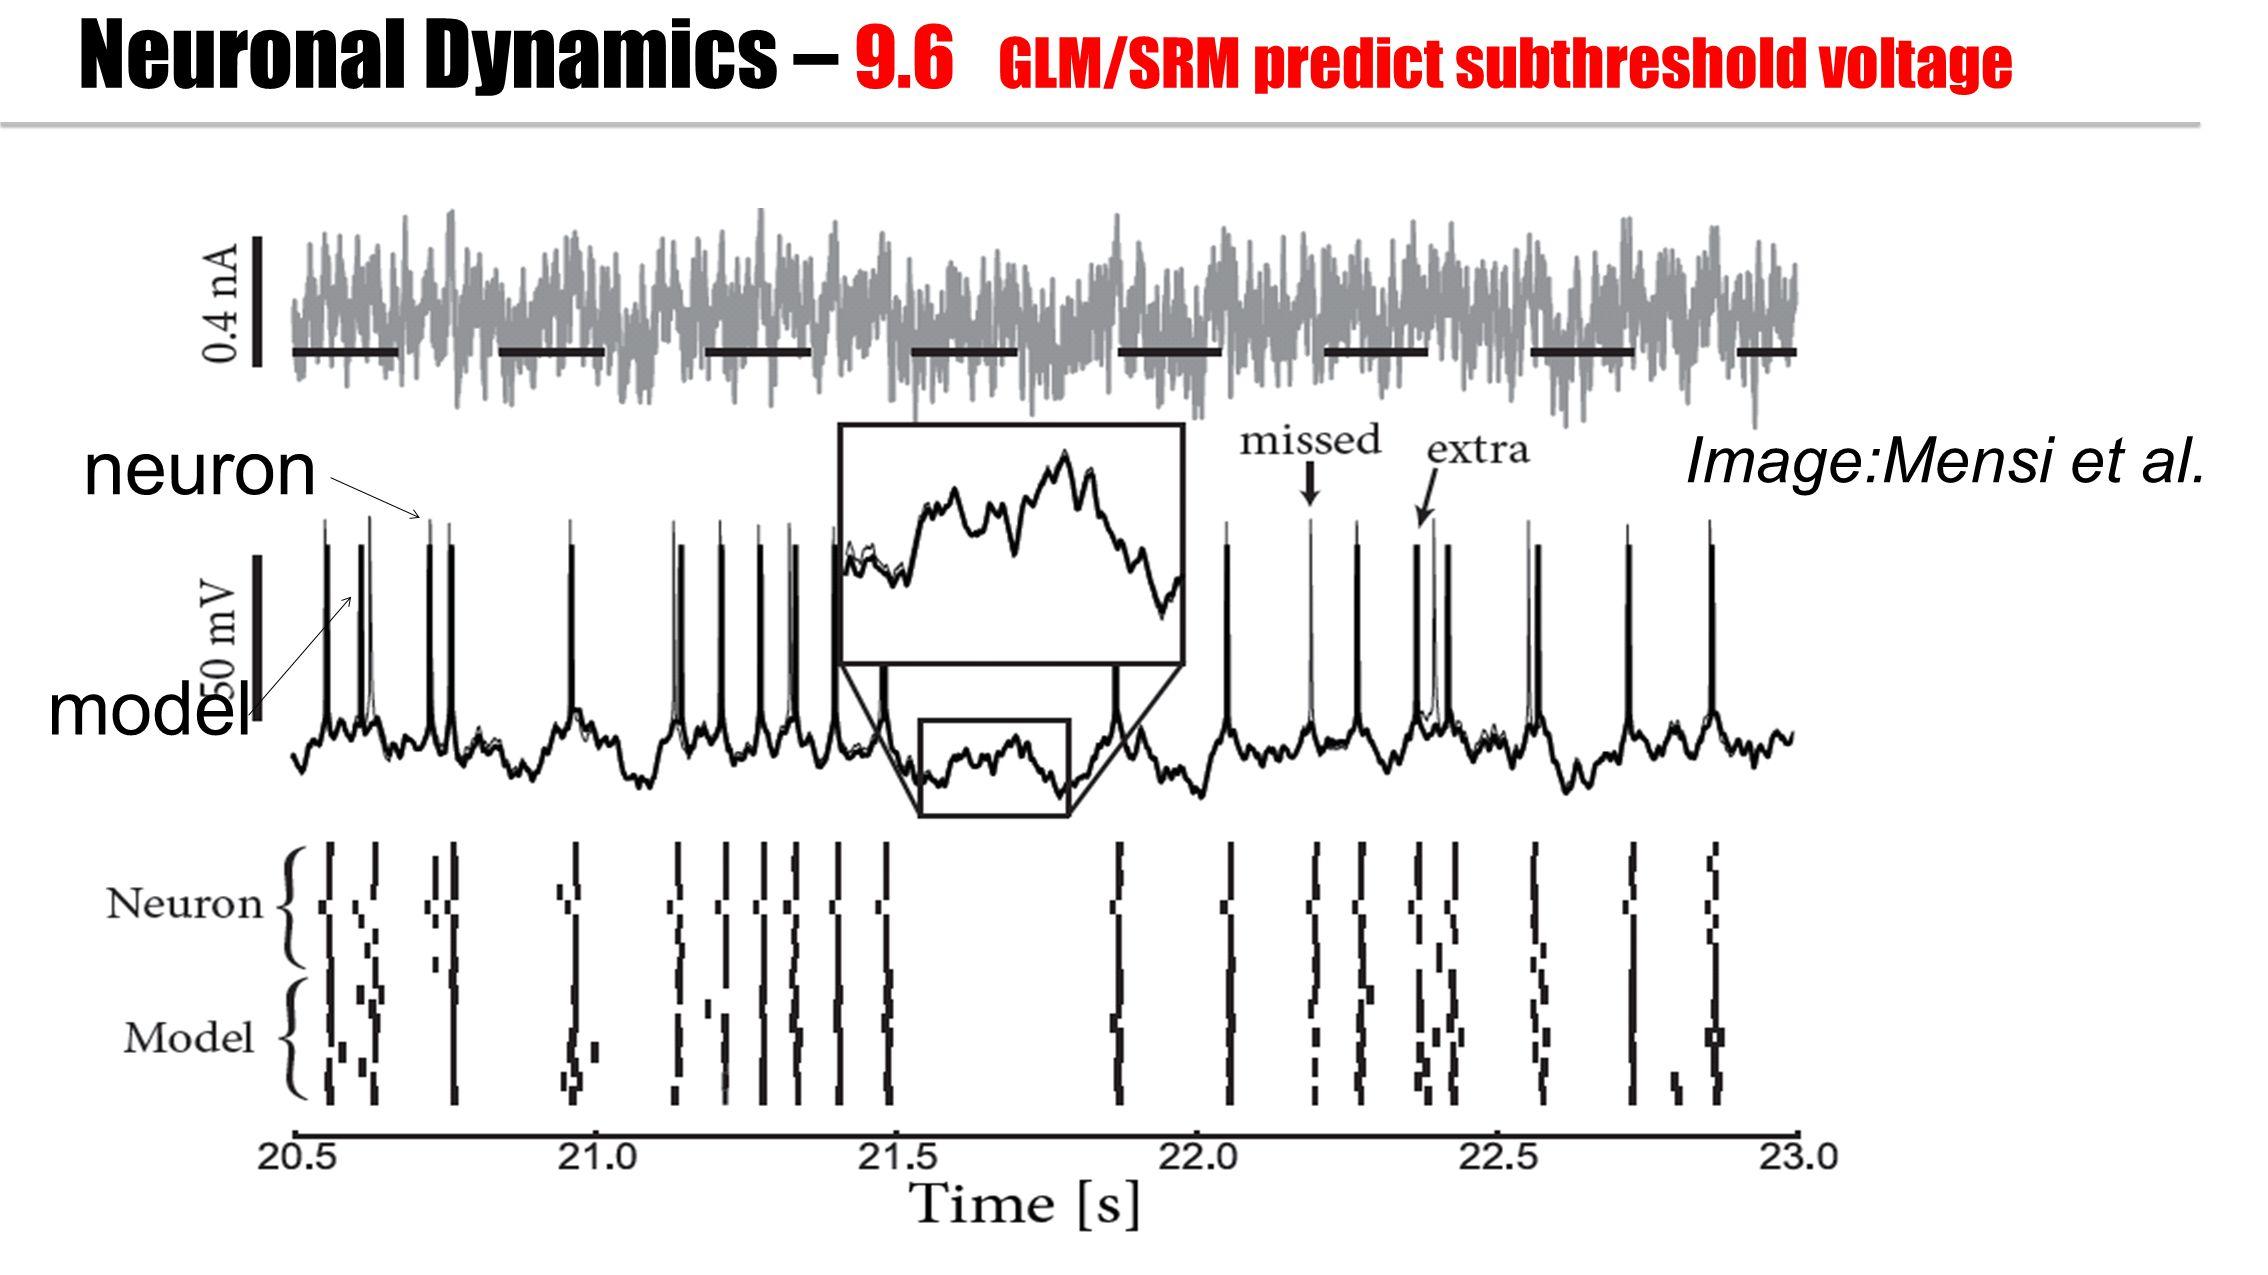 neuron model Image:Mensi et al. Neuronal Dynamics – 9.6 GLM/SRM predict subthreshold voltage